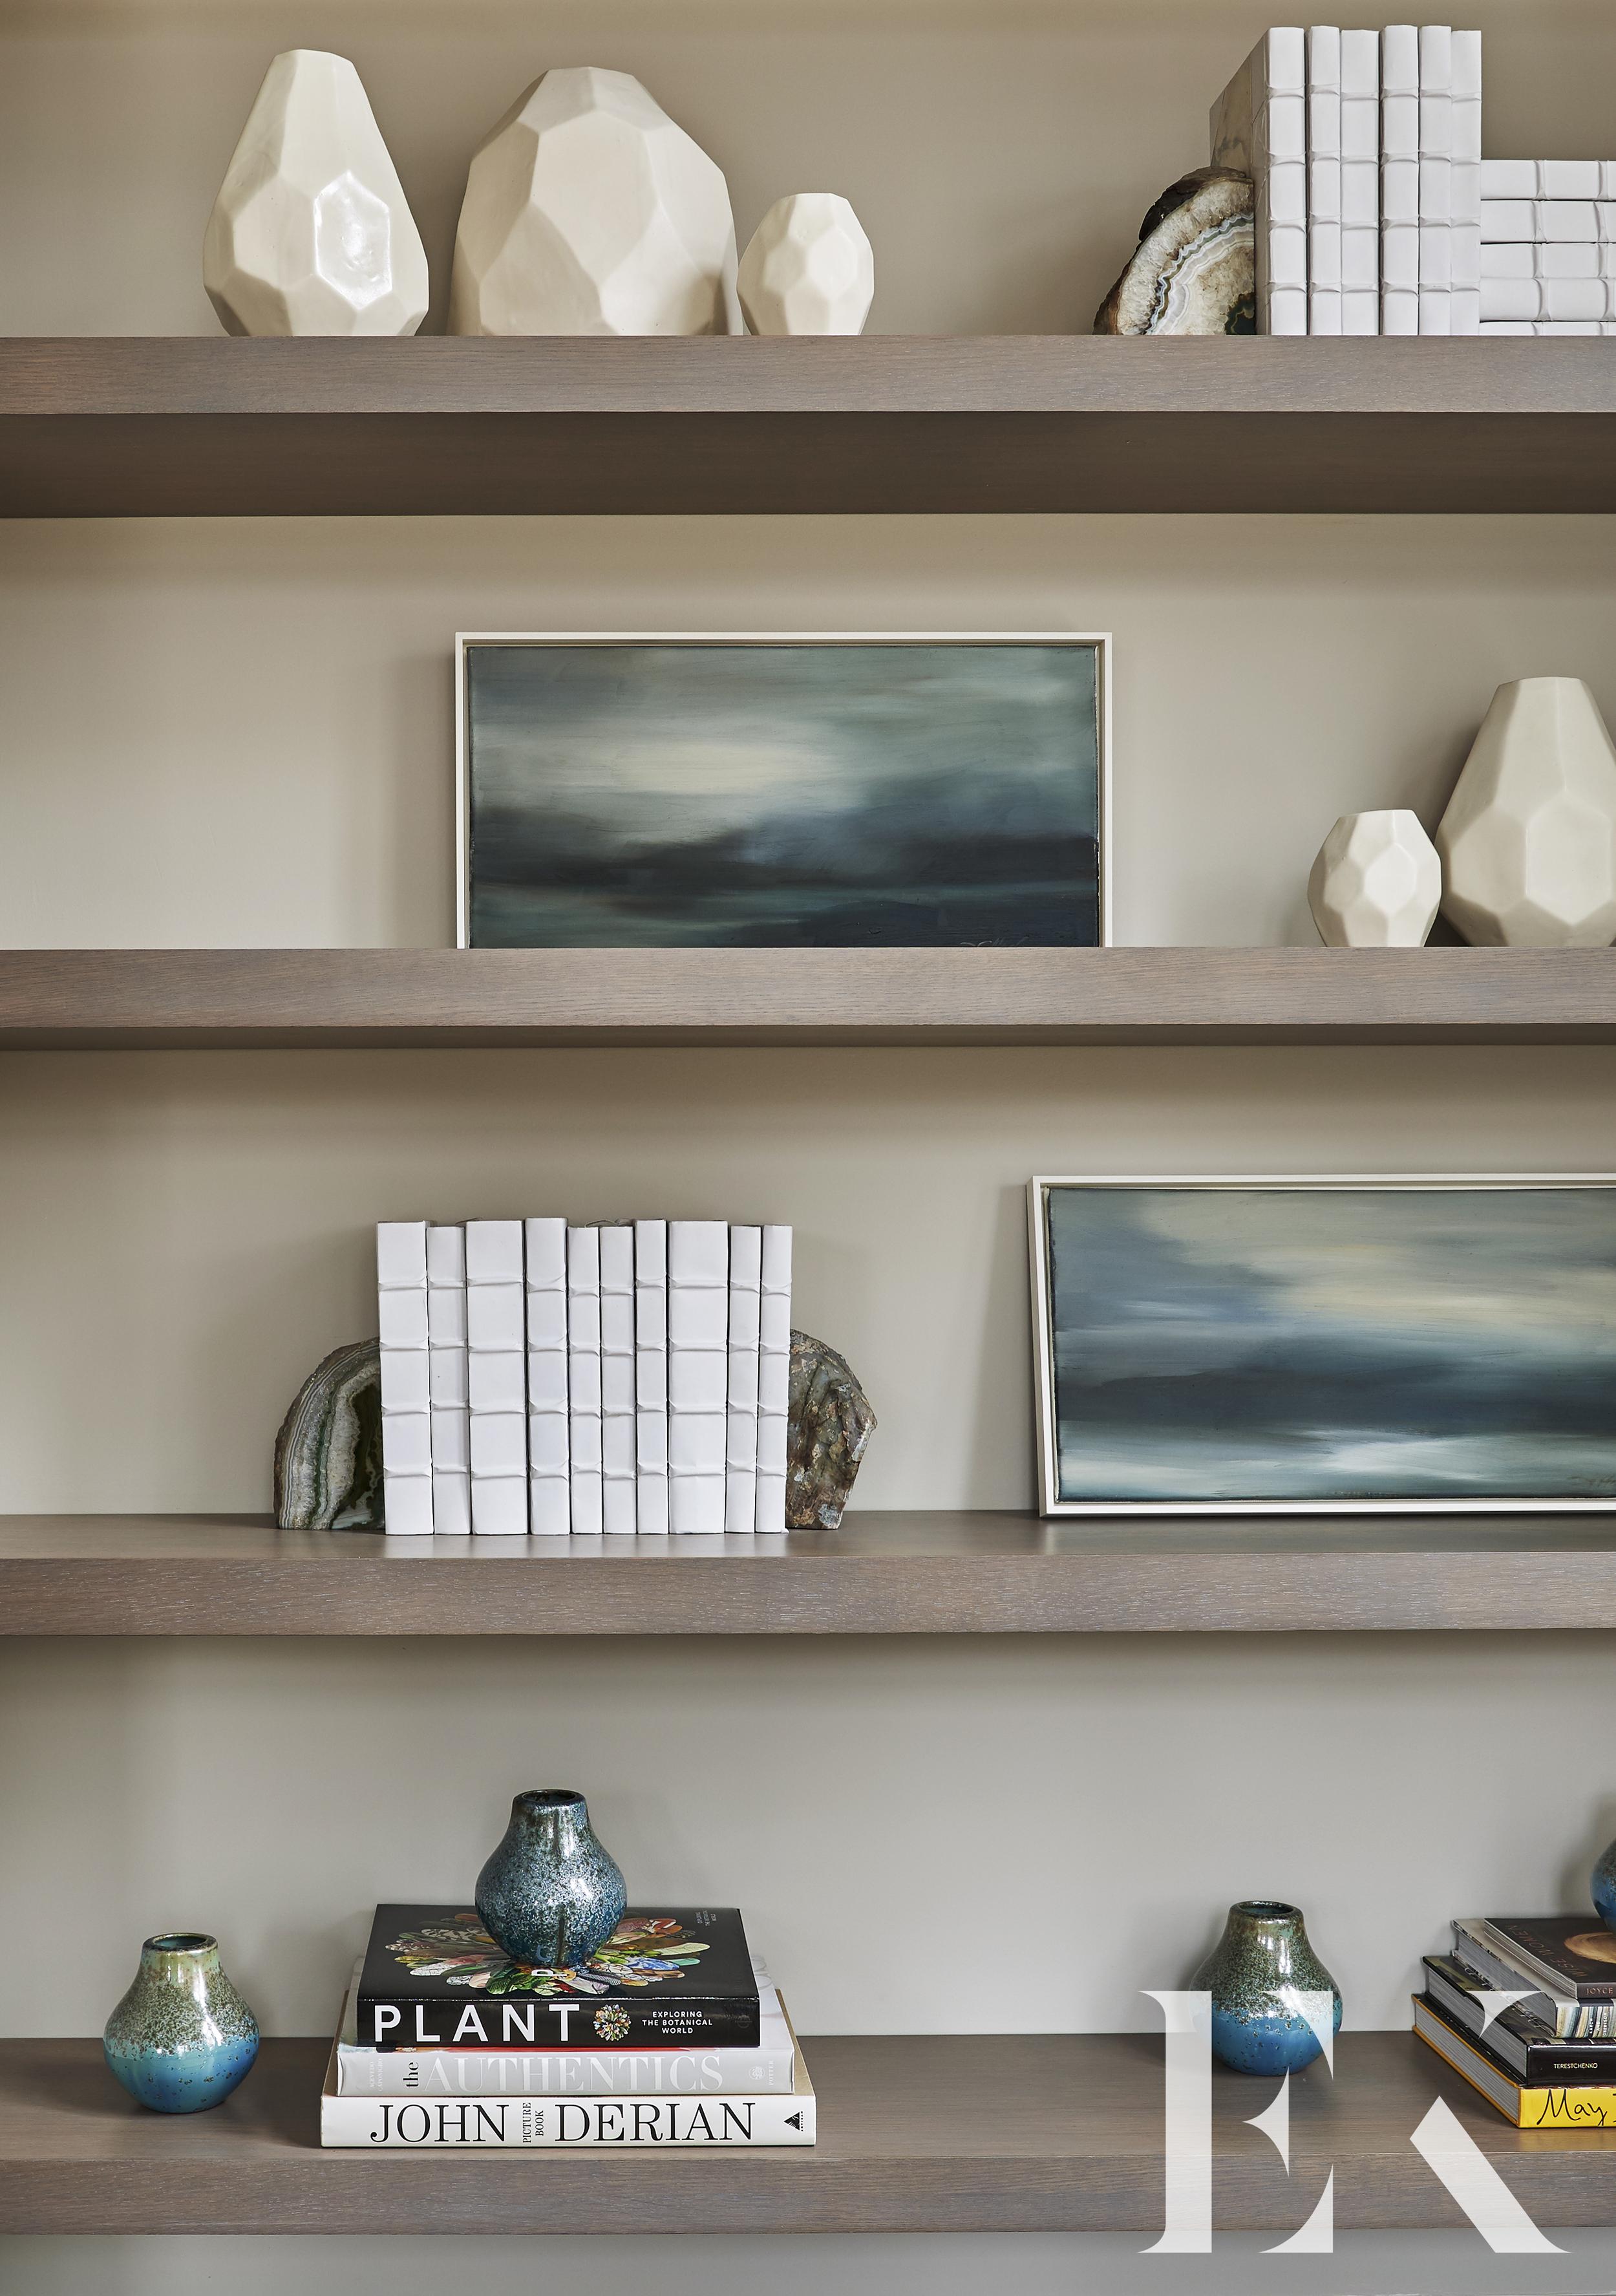 EKD, Interior Design Bookshelf with Accessories